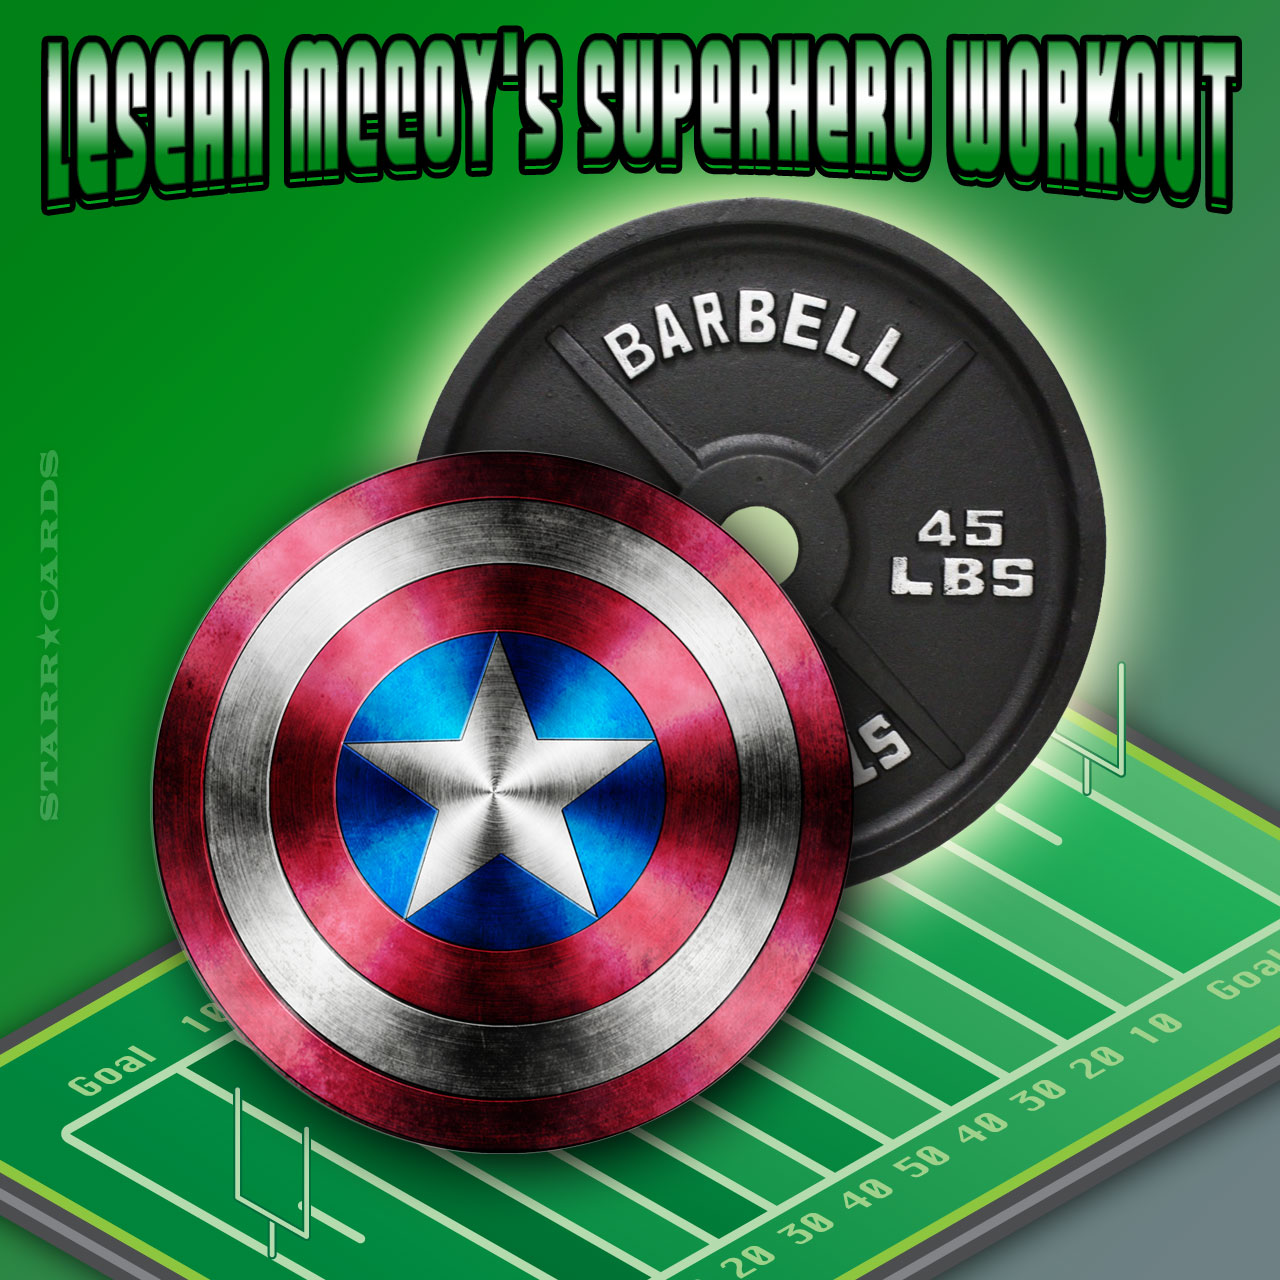 LeSean McCoy's superhero workout